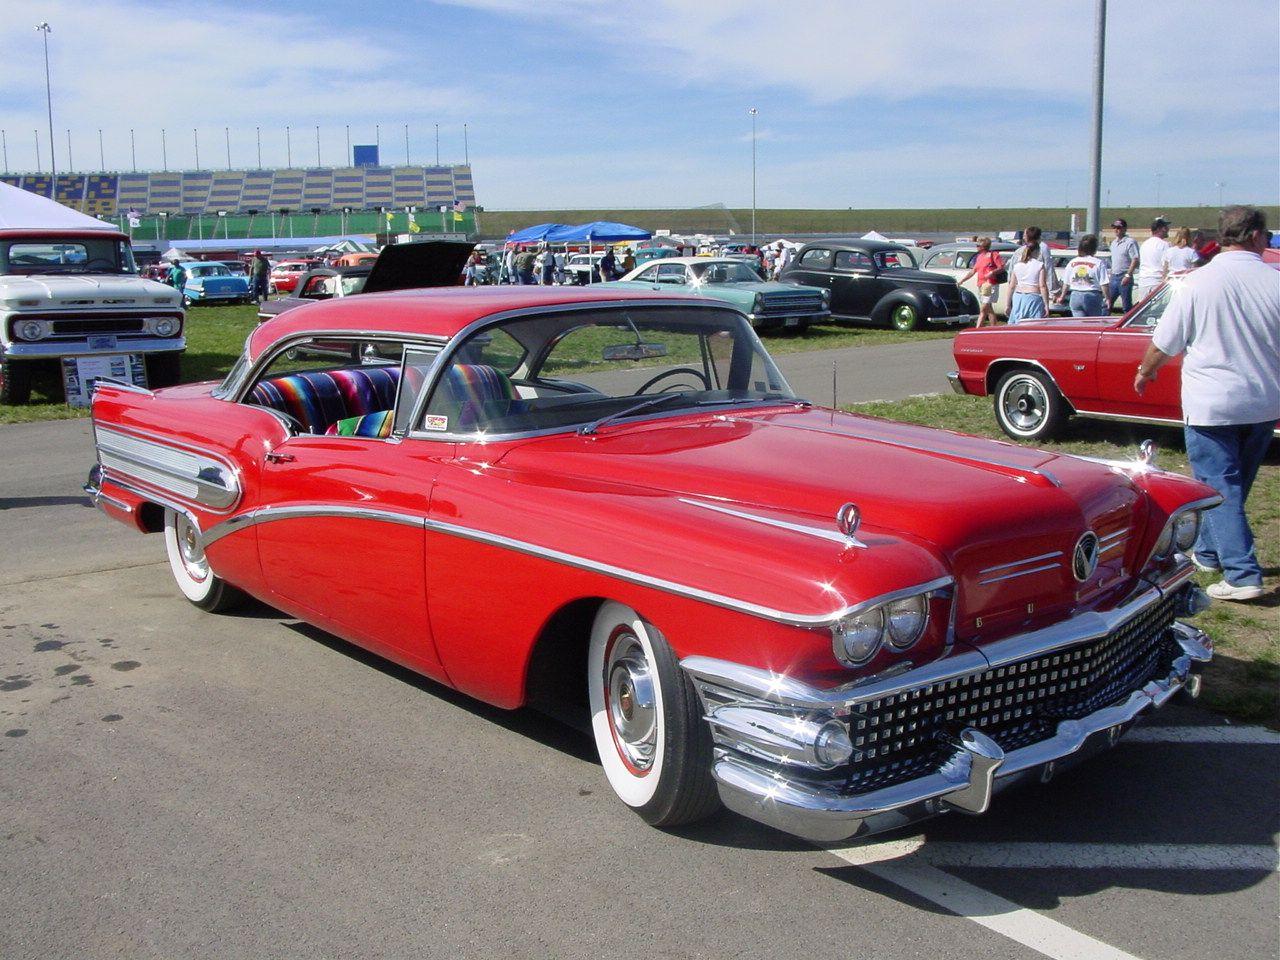 Goodguys in Kansas City, KS 2003 Old cars, Classic cars